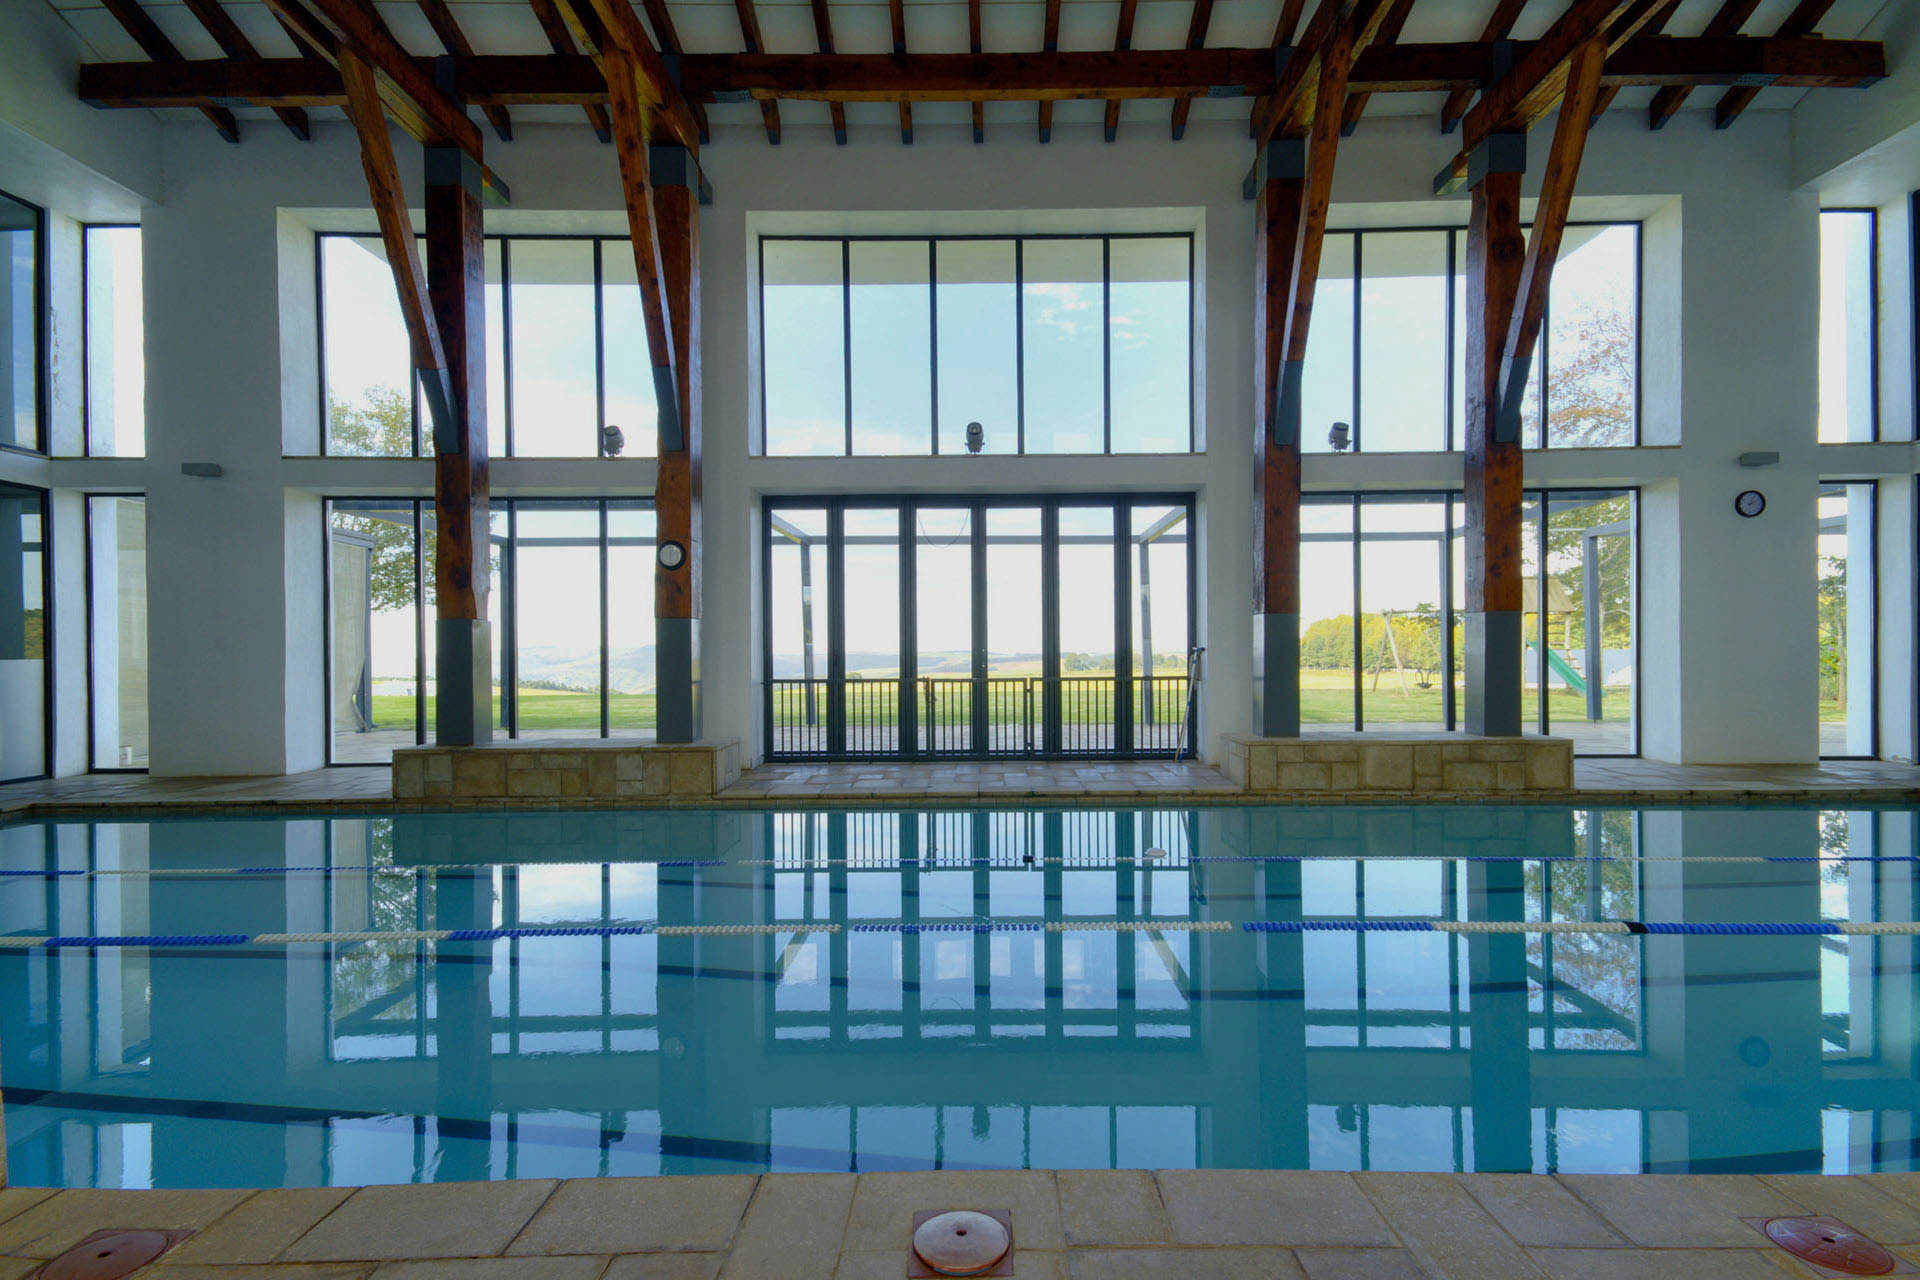 gym-garlington-estate-luxury-country-development-hilton-midlands-meander-countryside-contemporary-lifestyle-kzn